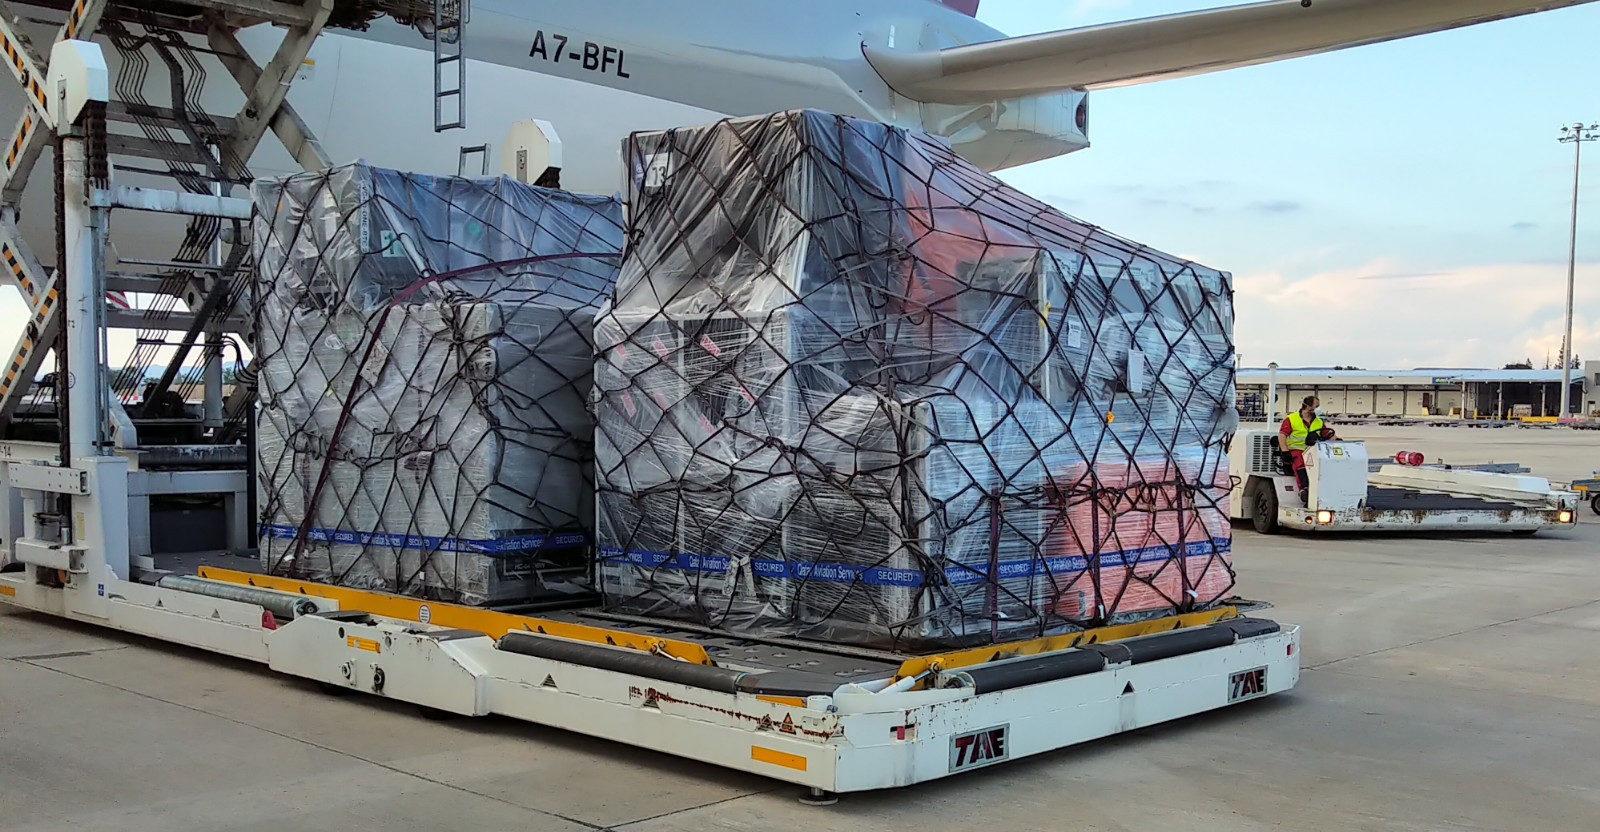 Airways cargo plane in Spain. Photo courtesy of Dorna.